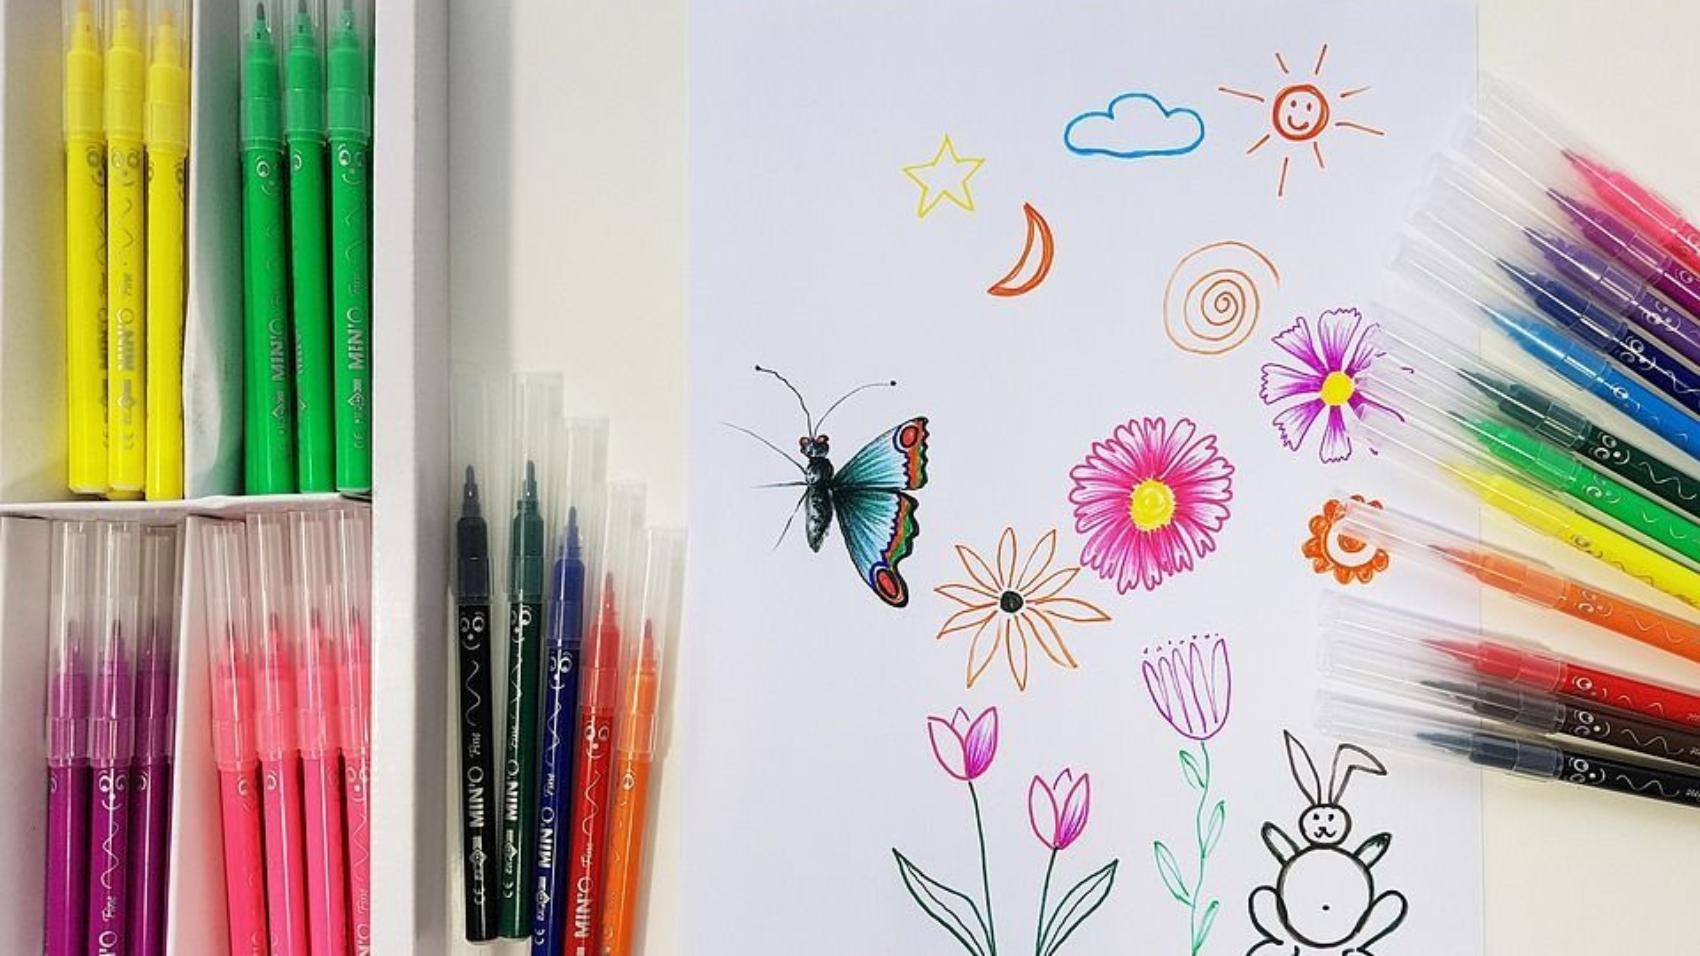 felt-tip-pens-3402878_960_720